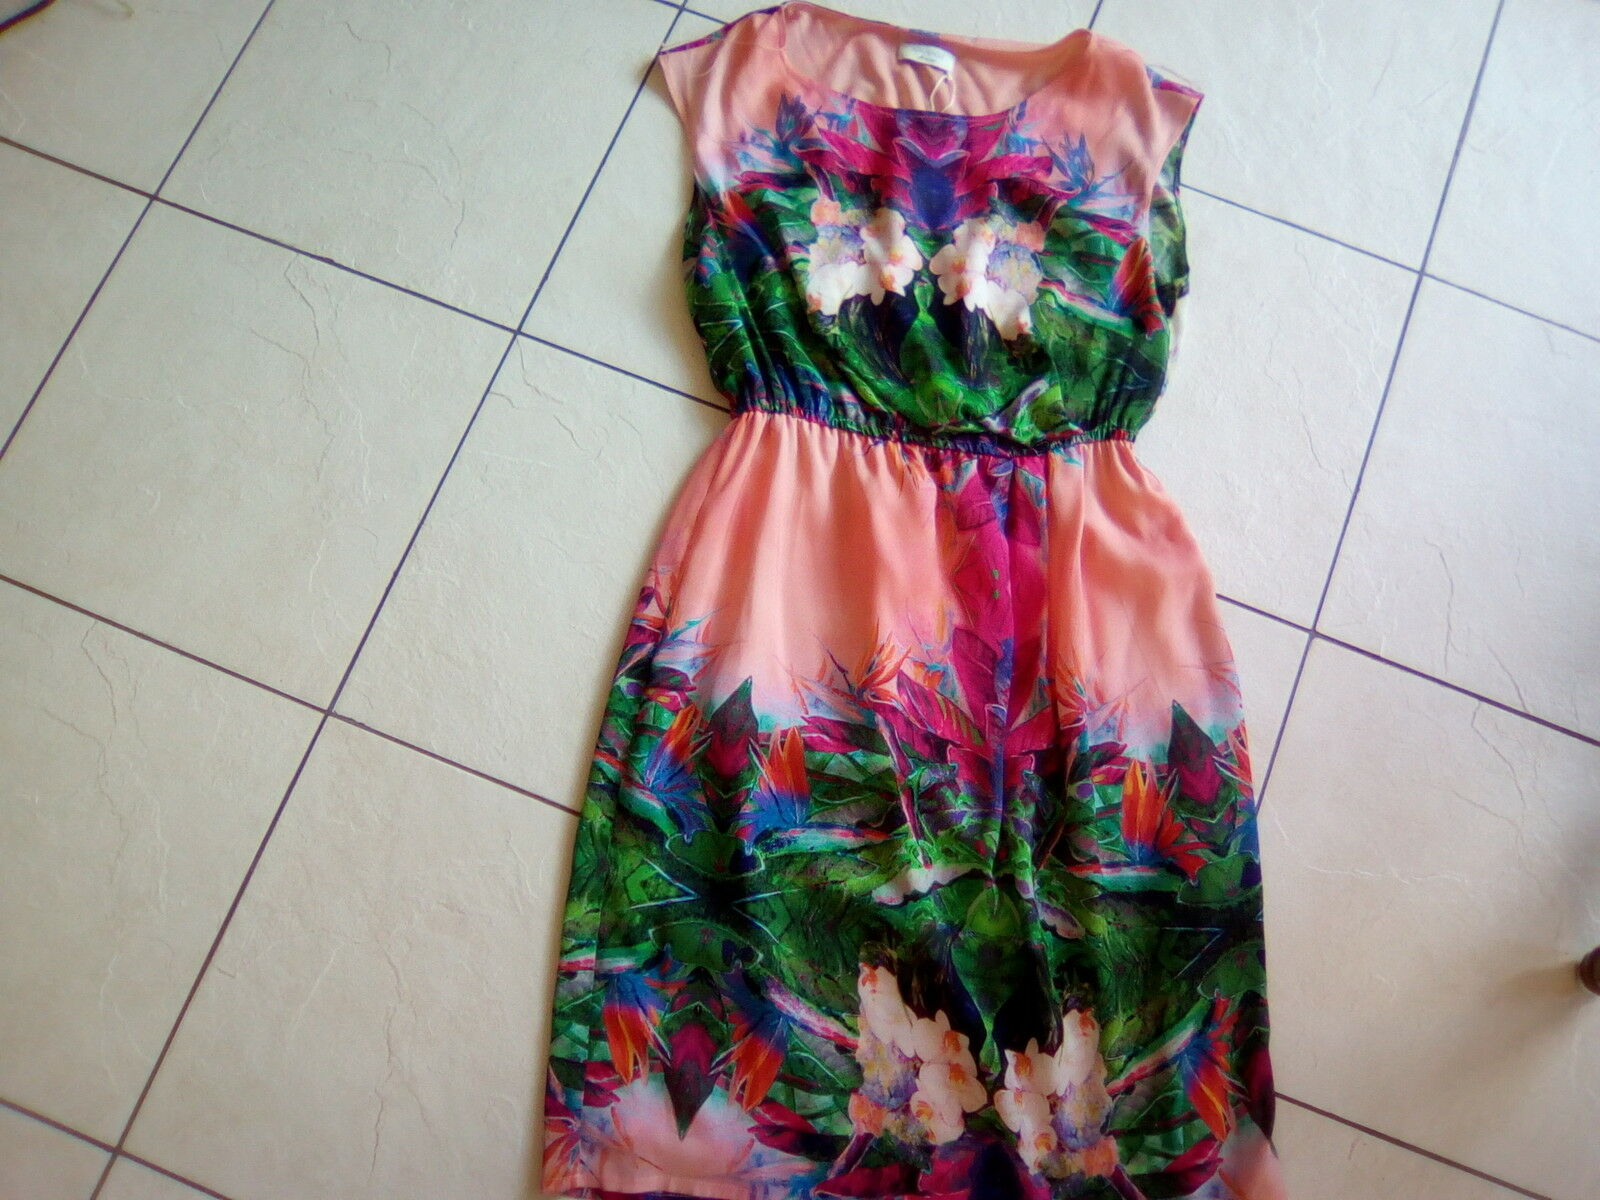 Apanage Kleid neu Grösse 36